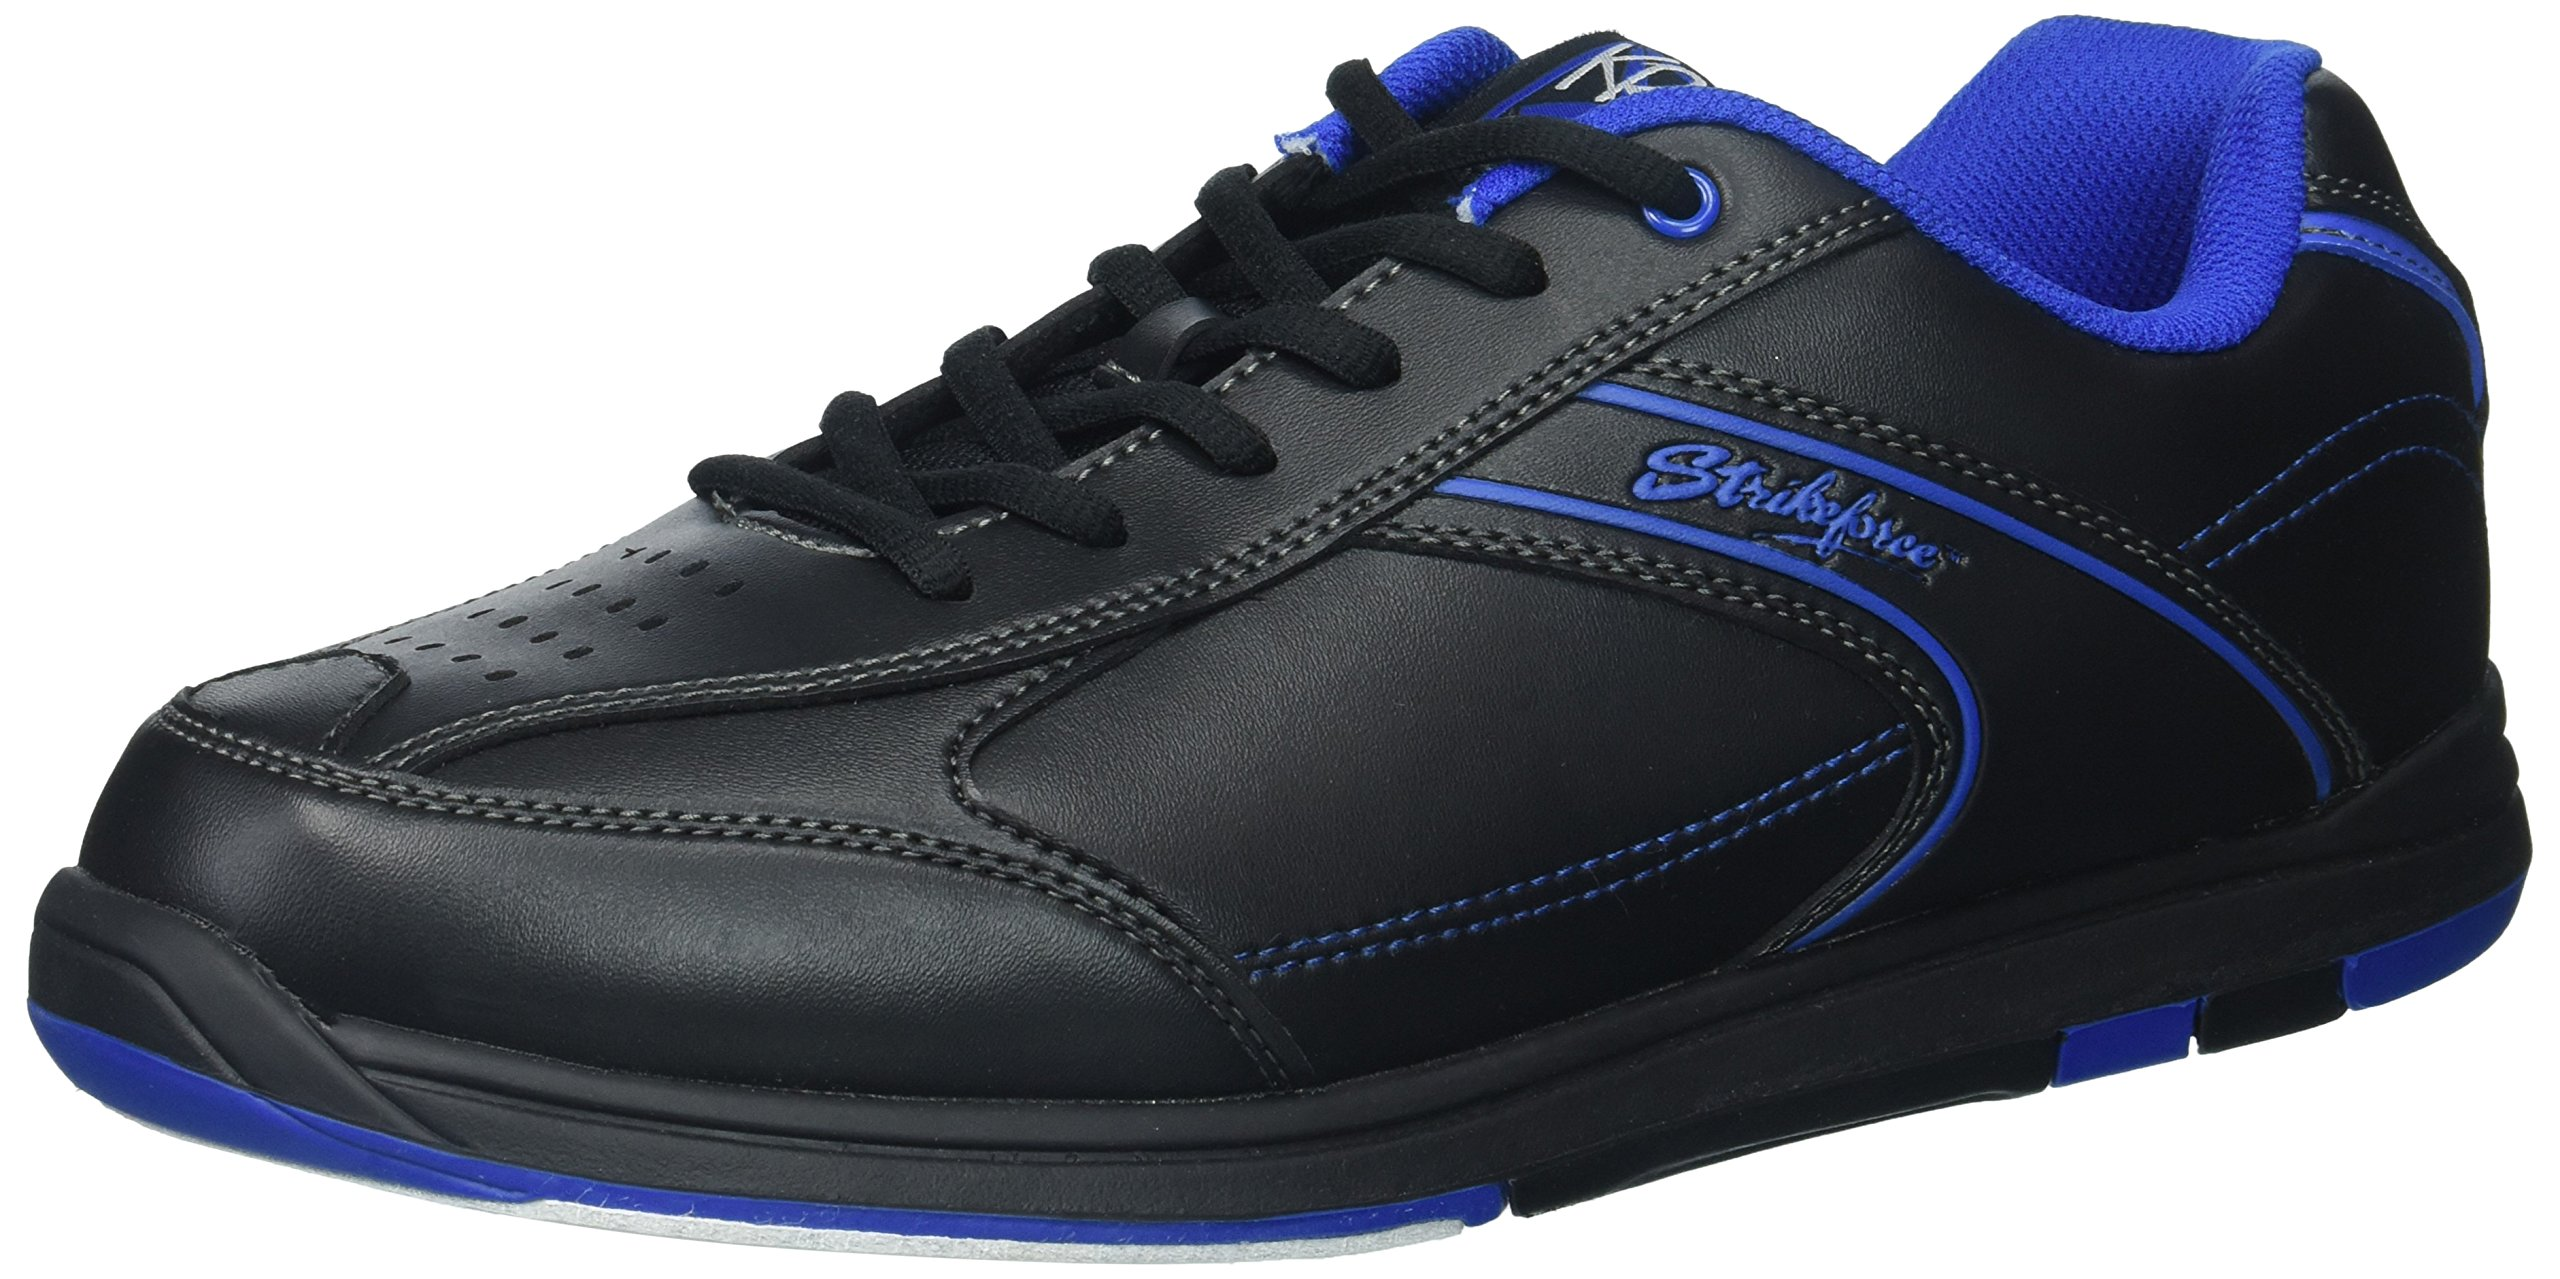 KR Strikeforce M-033-120 Flyer Bowling Shoes, Black/Mag Blue, Size 12 by KR